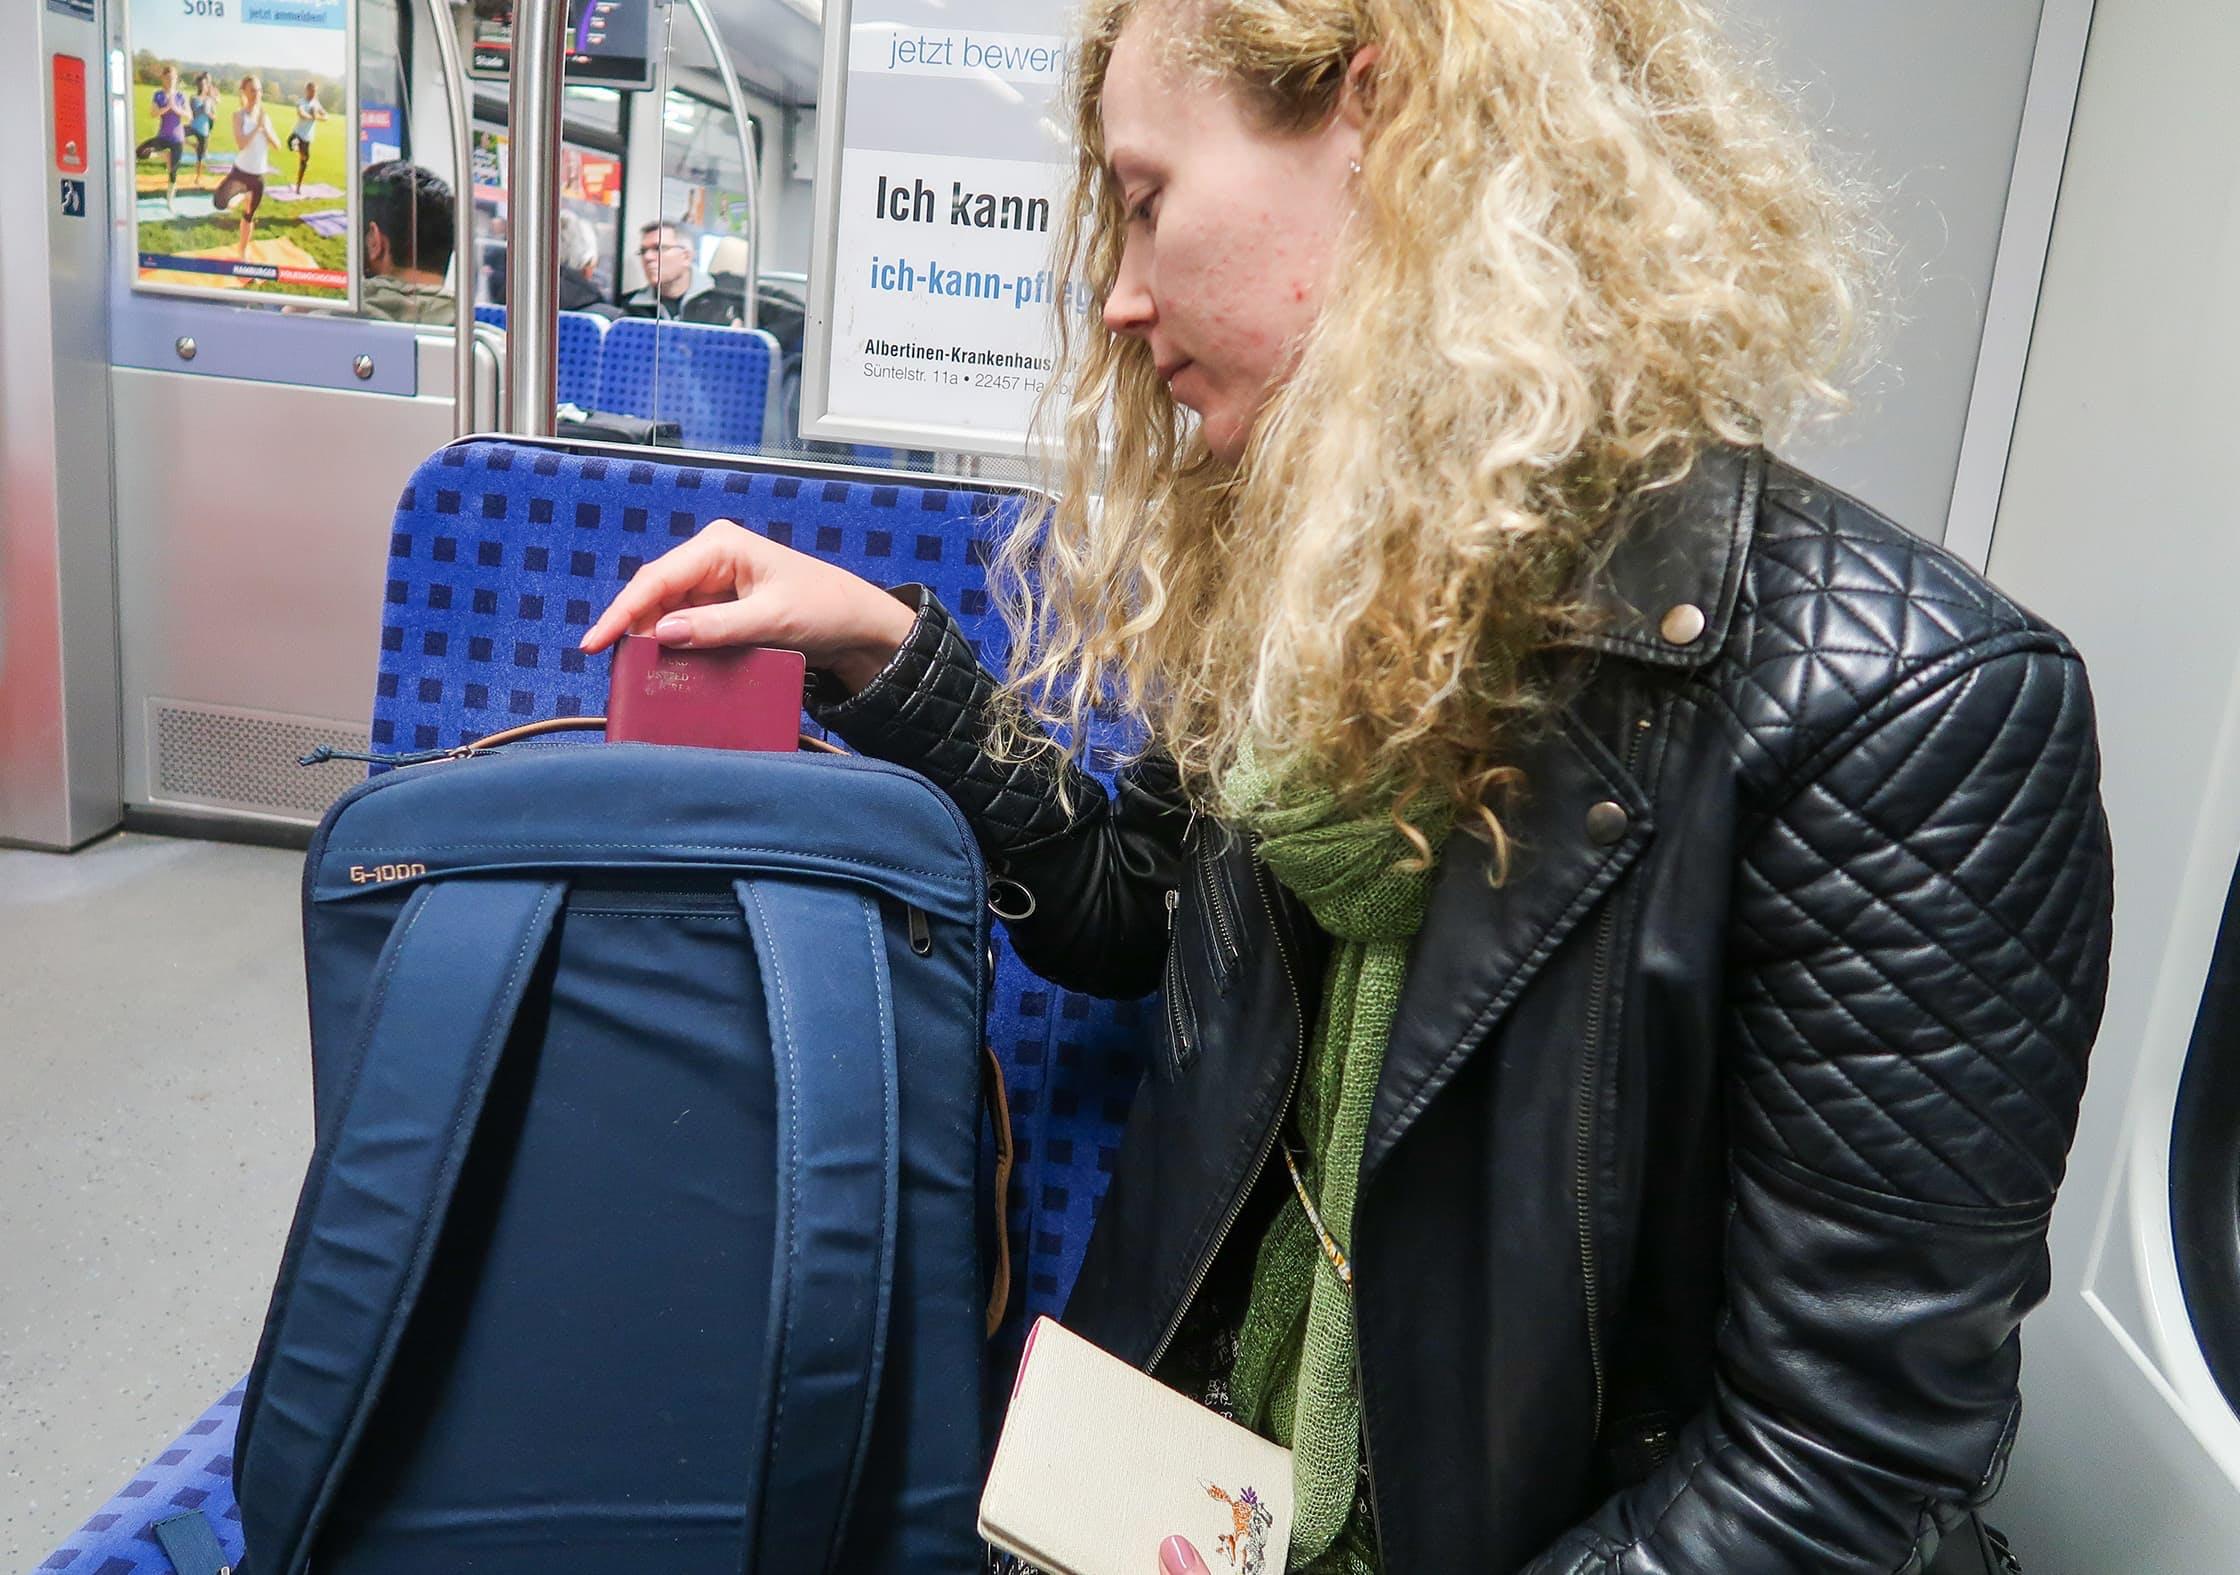 Fjallraven Travel Pack Quick-Grab Pocket